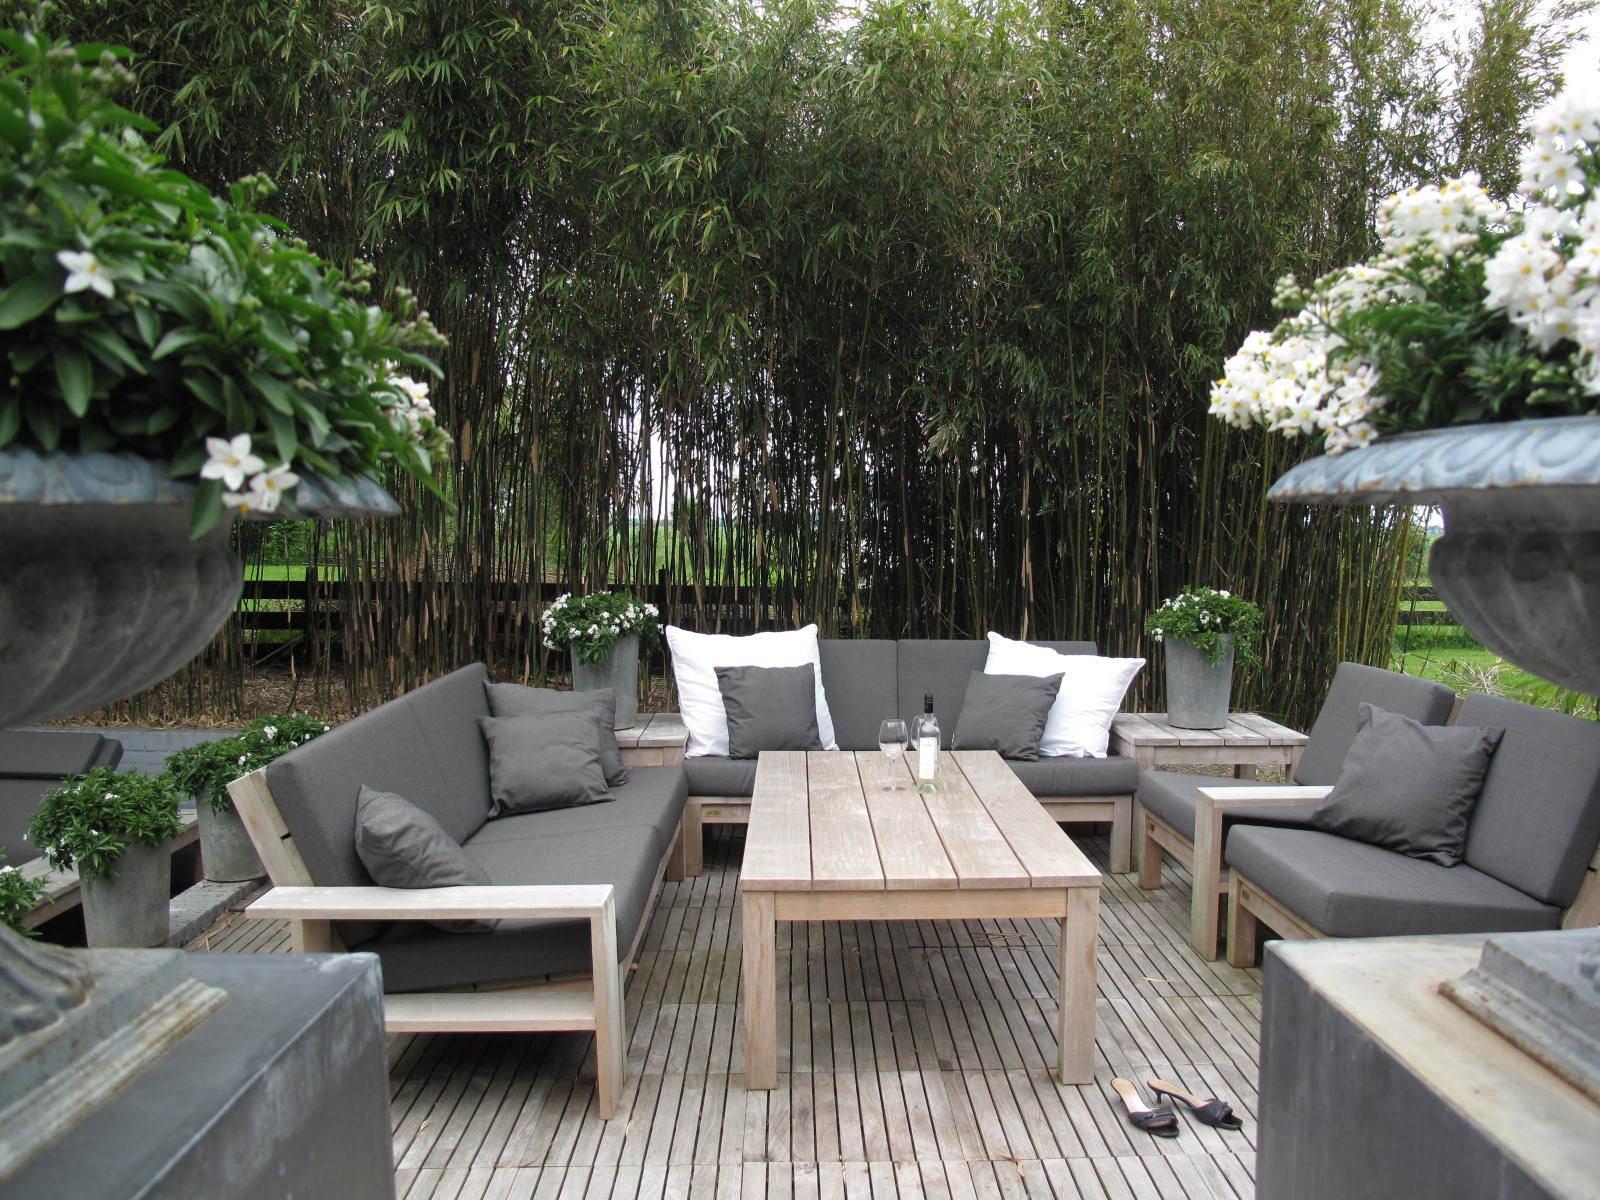 Teak salon tafel | Teak loungetafel | Teak tafel bij loungeset - Annapart 4